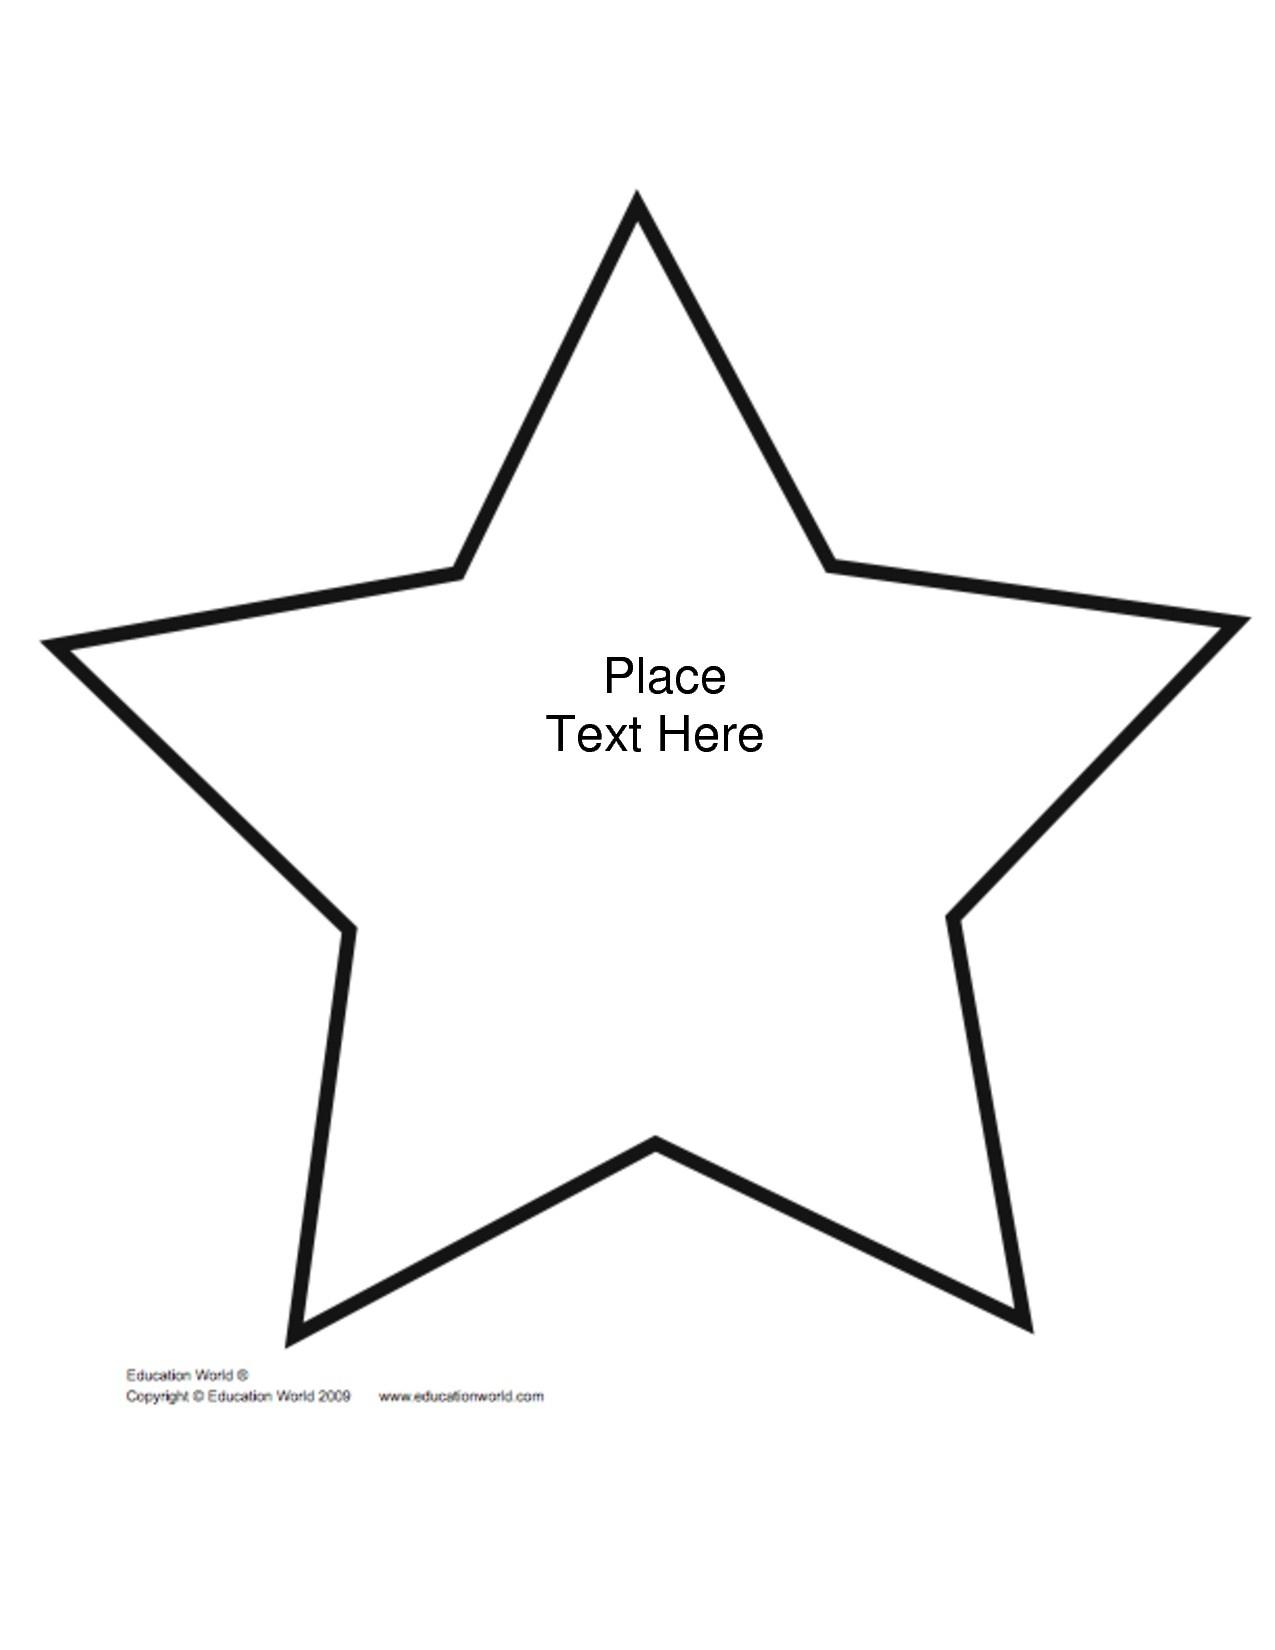 Star Outline Printable | Free Download Best Star Outline Printable - Large Printable Shapes Free